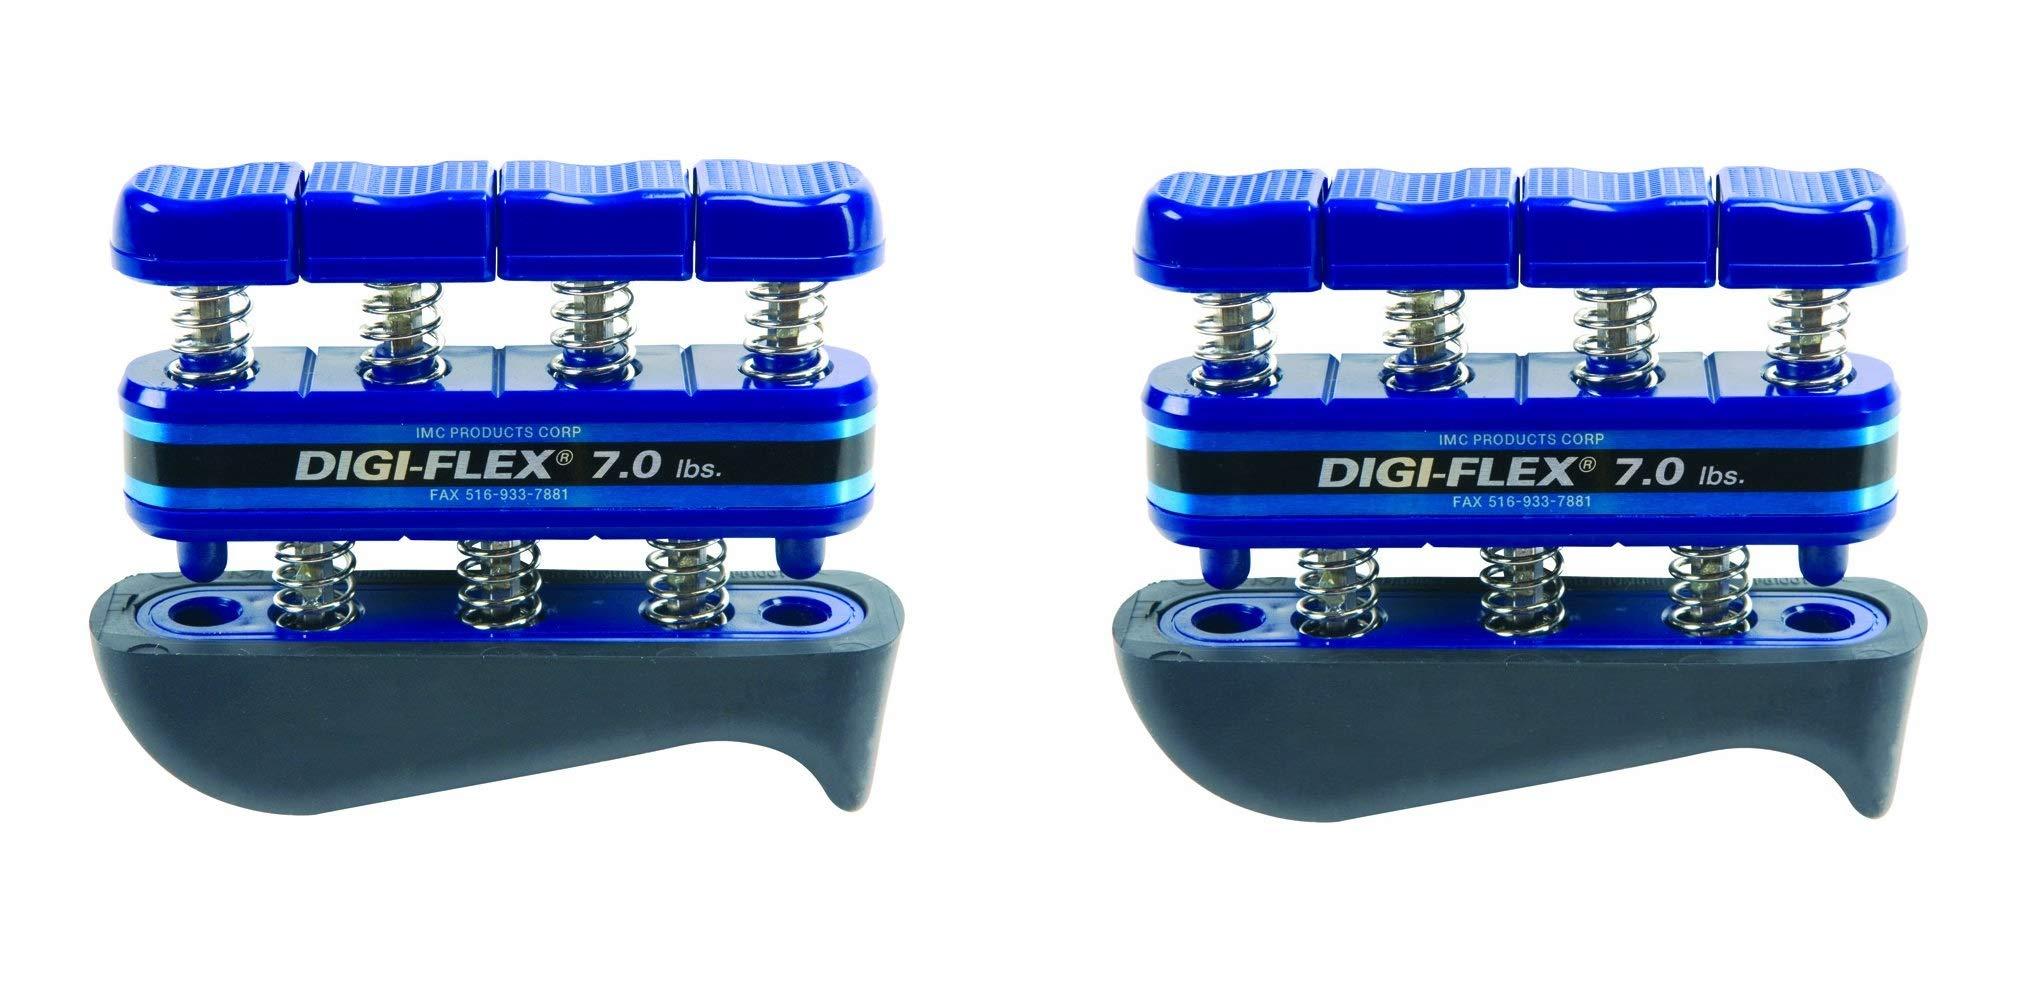 Digi-Flex Blue Hand and Finger Exercise System, 7 lbs Resistance (2-Pack)